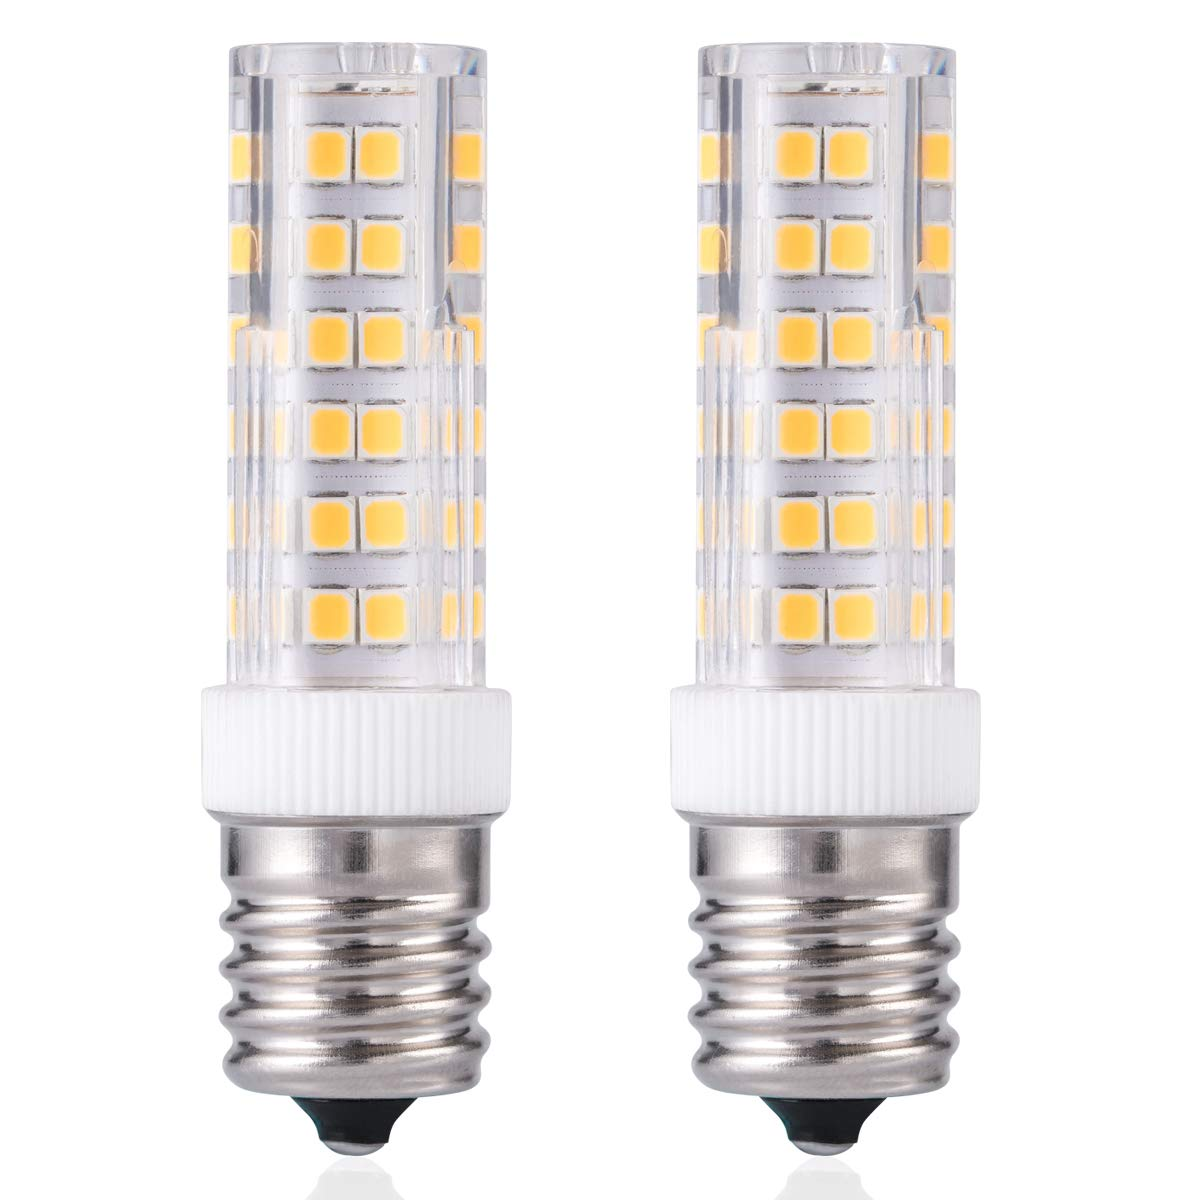 e17 led bulb over counter microwave oven light dimmable 6 watt warm white 3000k for ceiling fan light fixture pack of 2